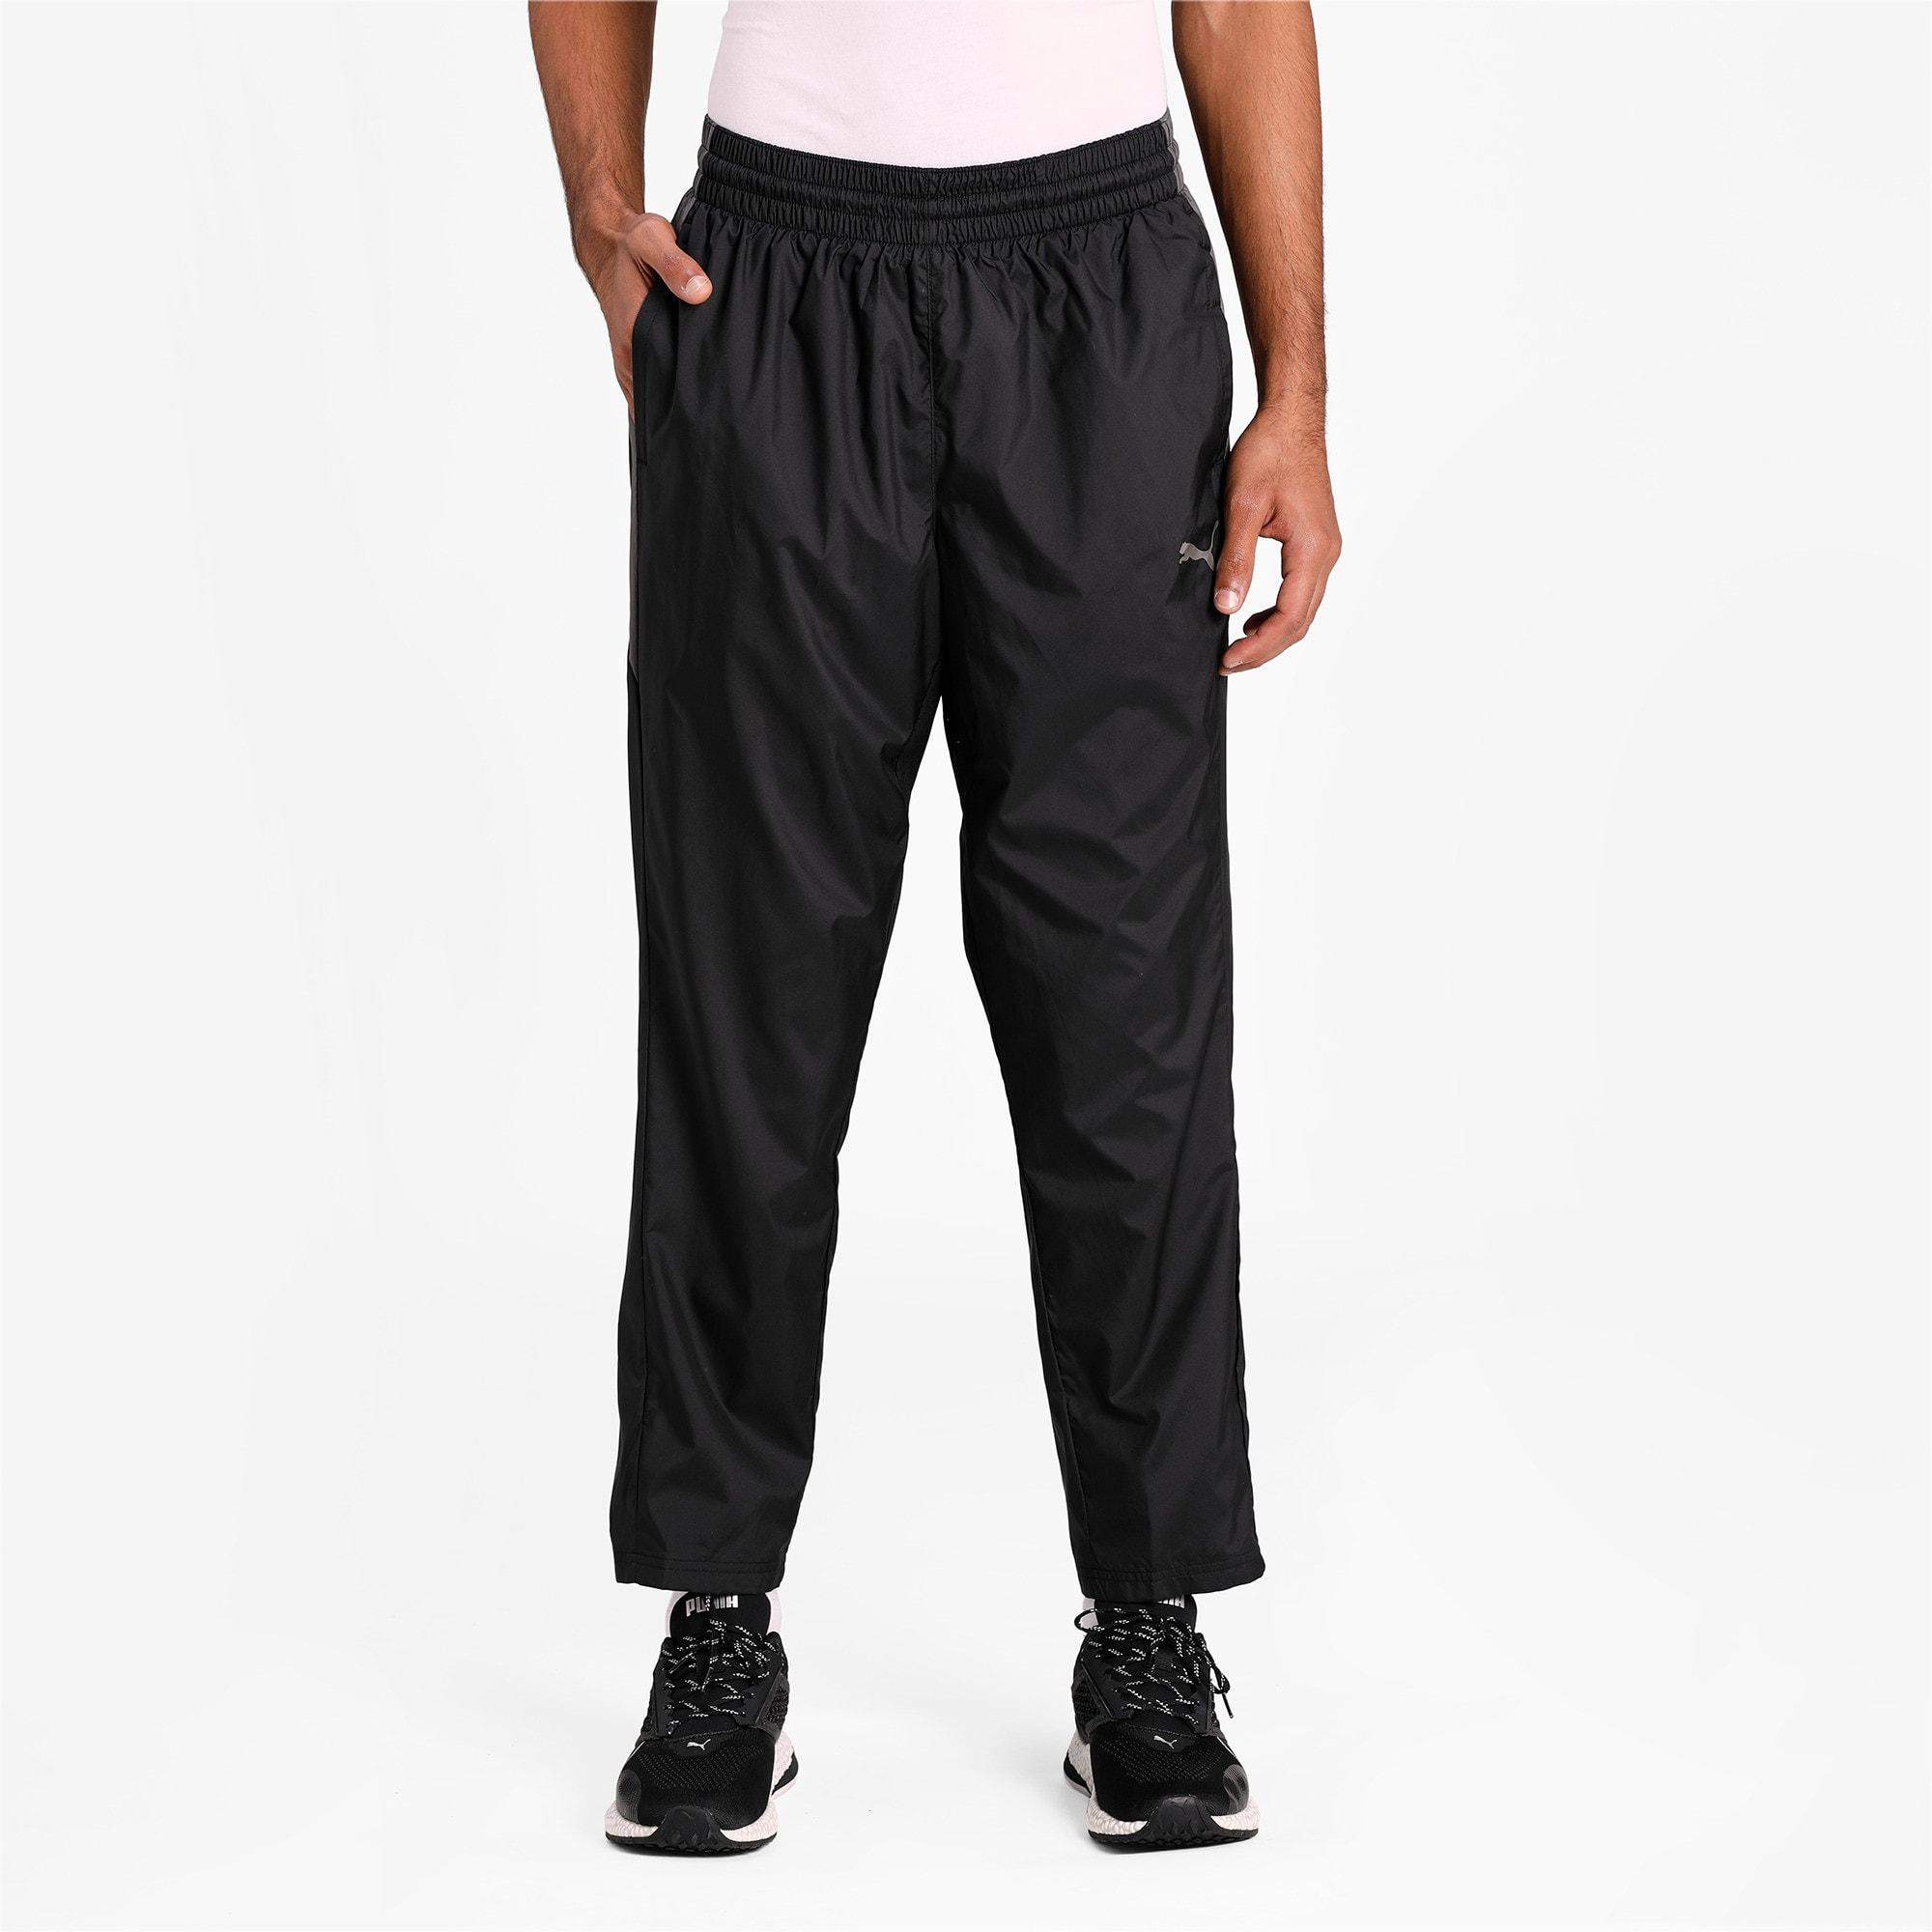 Thumbnail 1 of Reactive Woven Men's Training Pants, Puma Black-CASTLEROCK, medium-IND